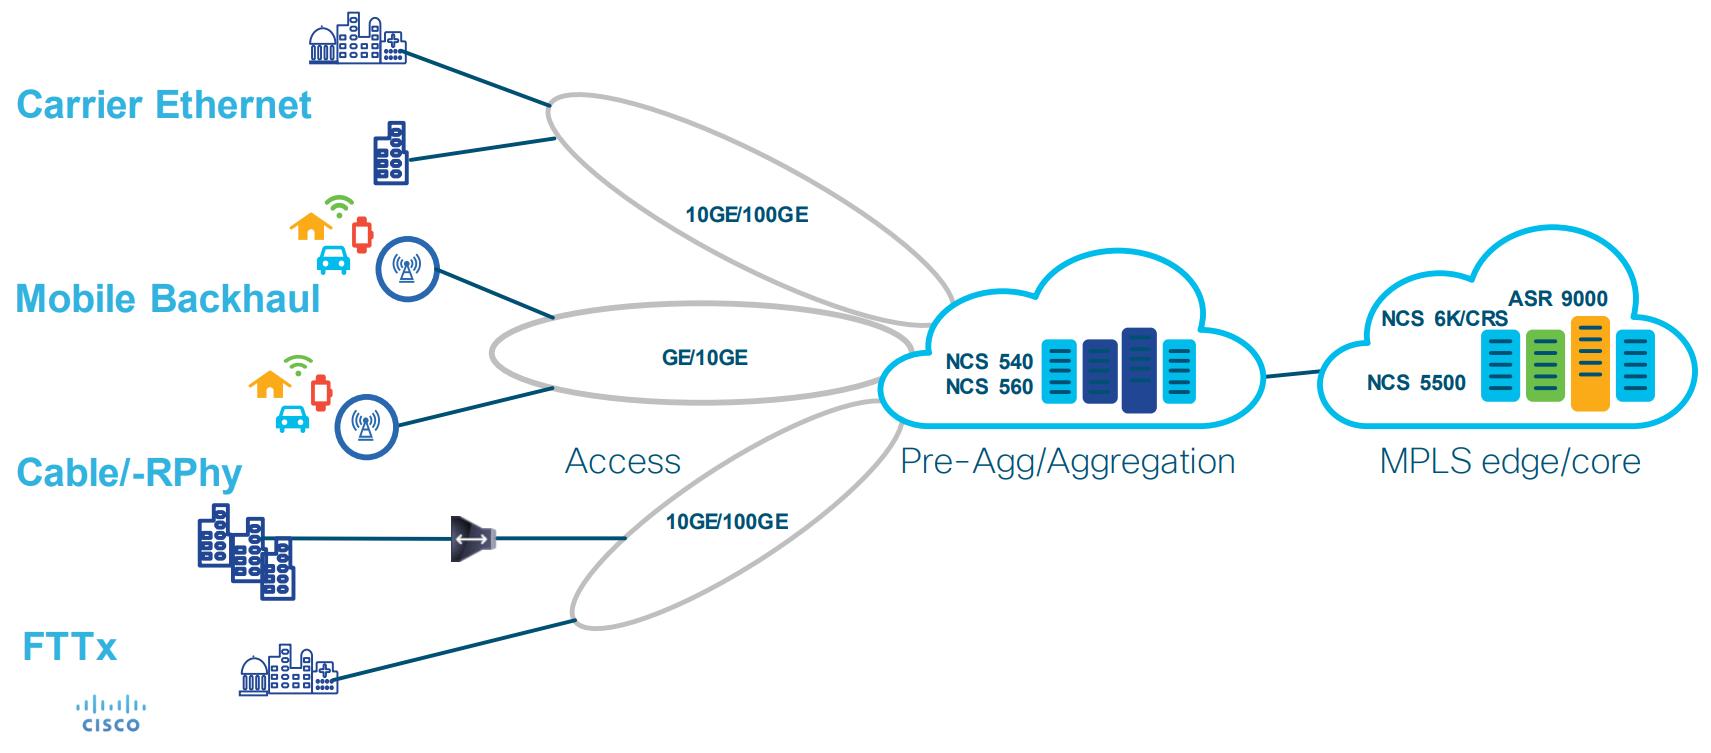 NCS 540 Pre-Aggregation